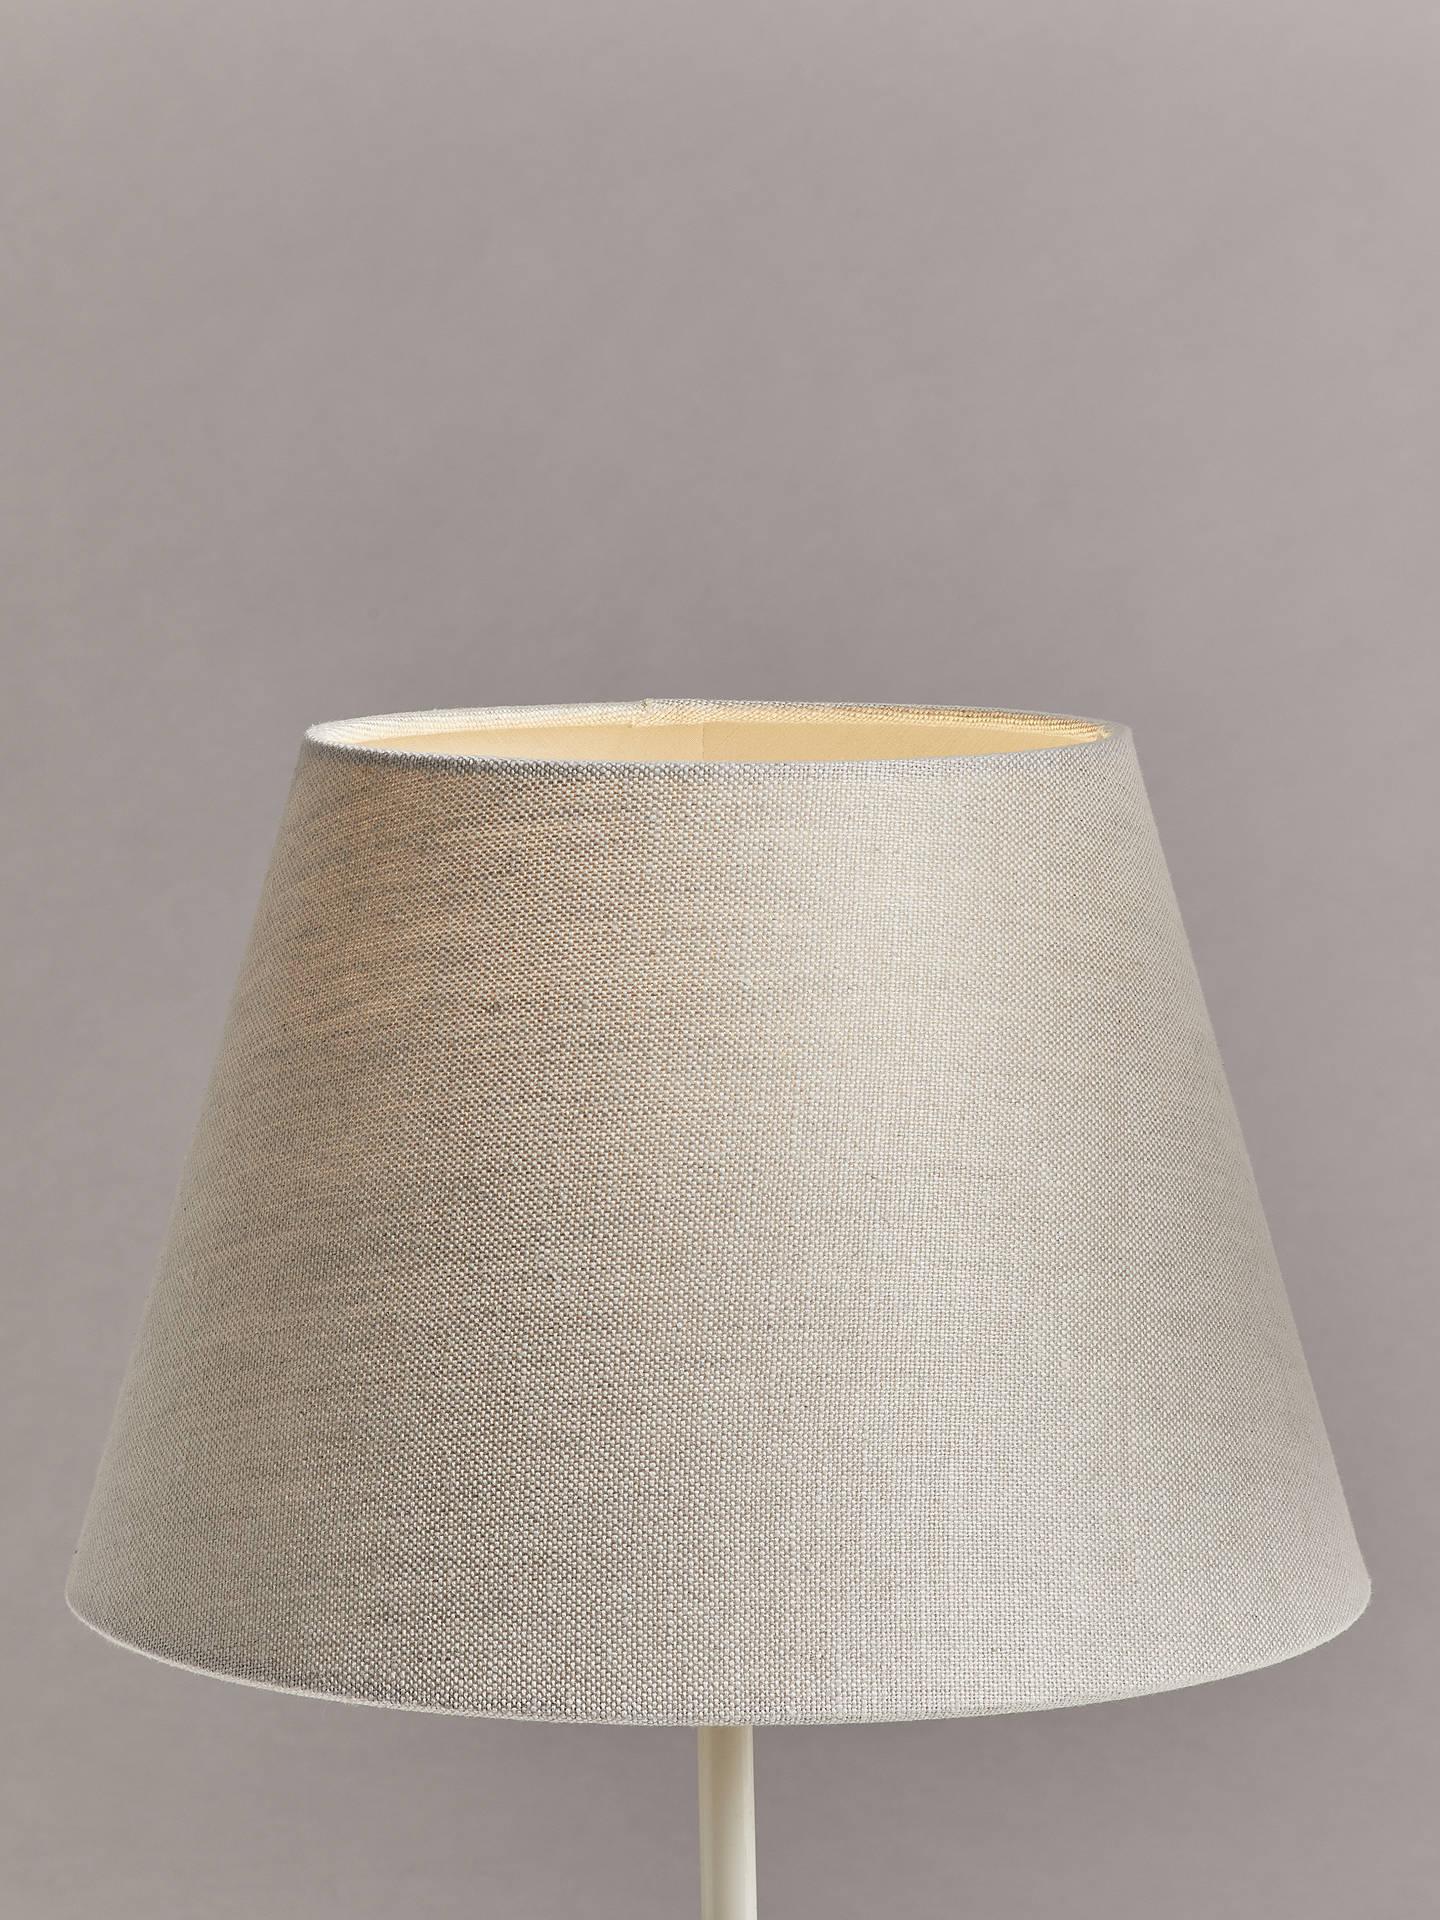 Lampshades Lightshades Star Wars Tapered Ceiling Light Shade Kids Bedroom Nursery Home Furniture Diy Tallergrafico Com Uy